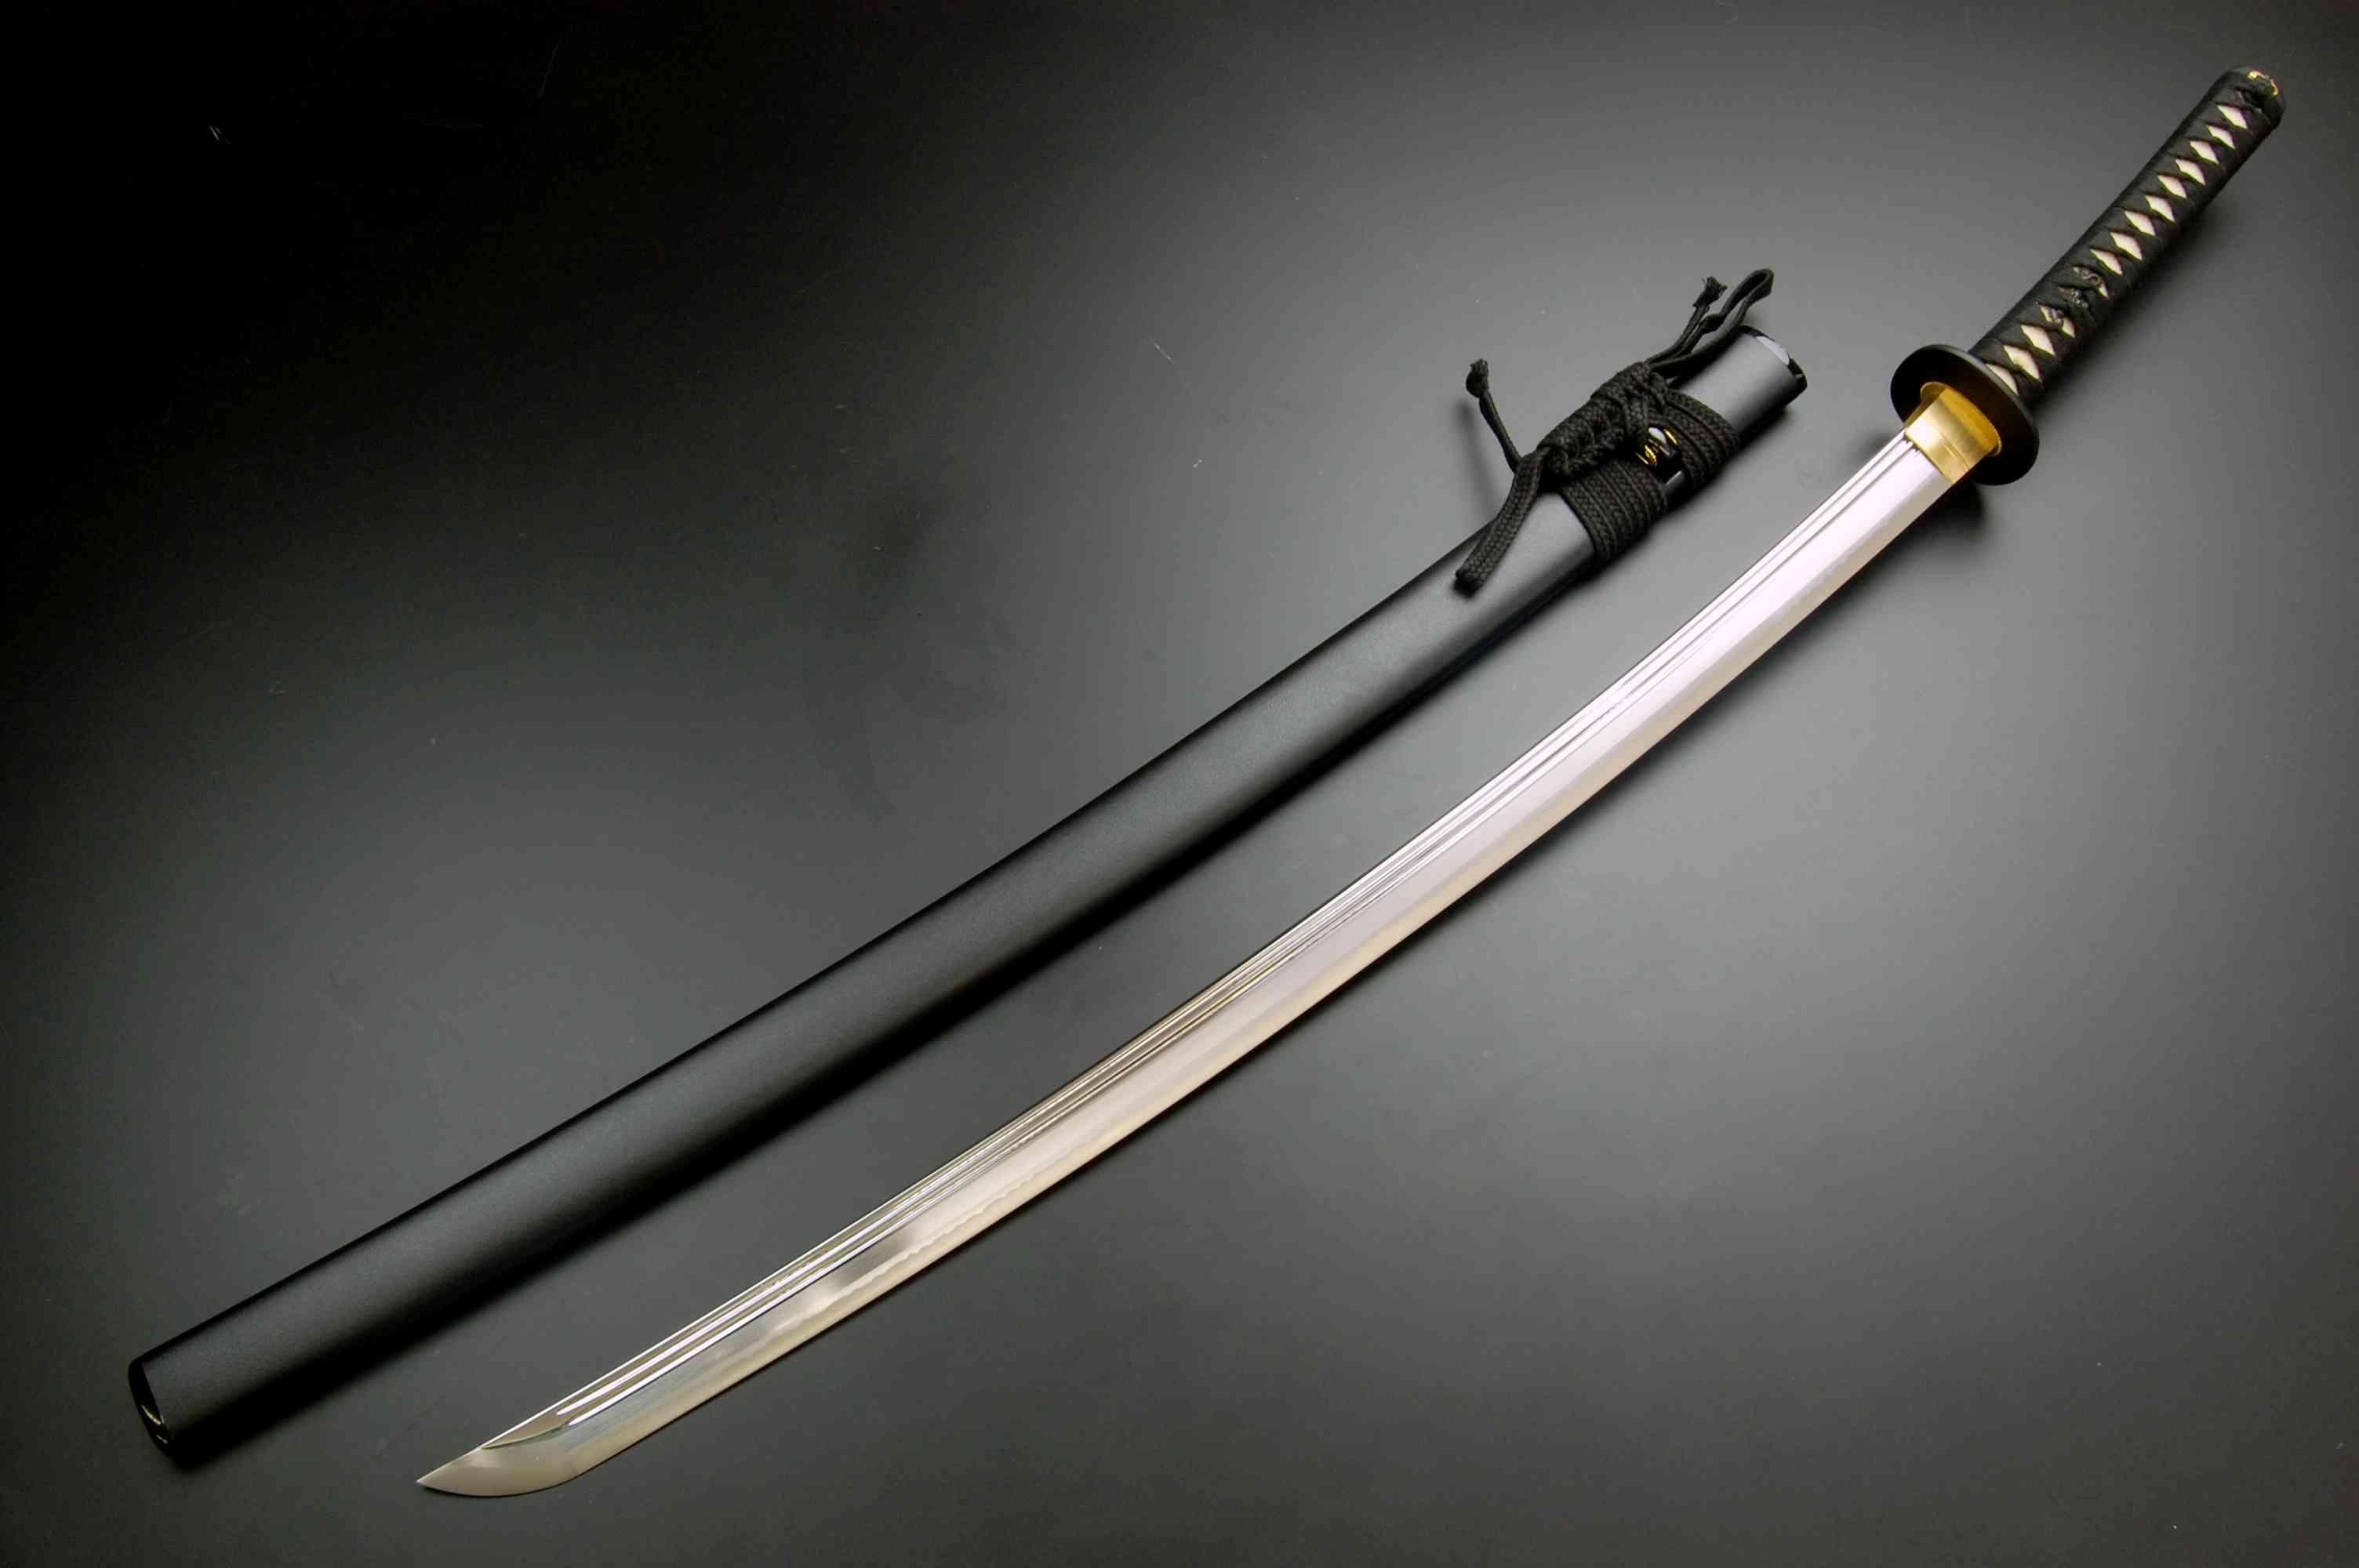 同田貫2尺5寸(肥後拵え・二本樋)大刀